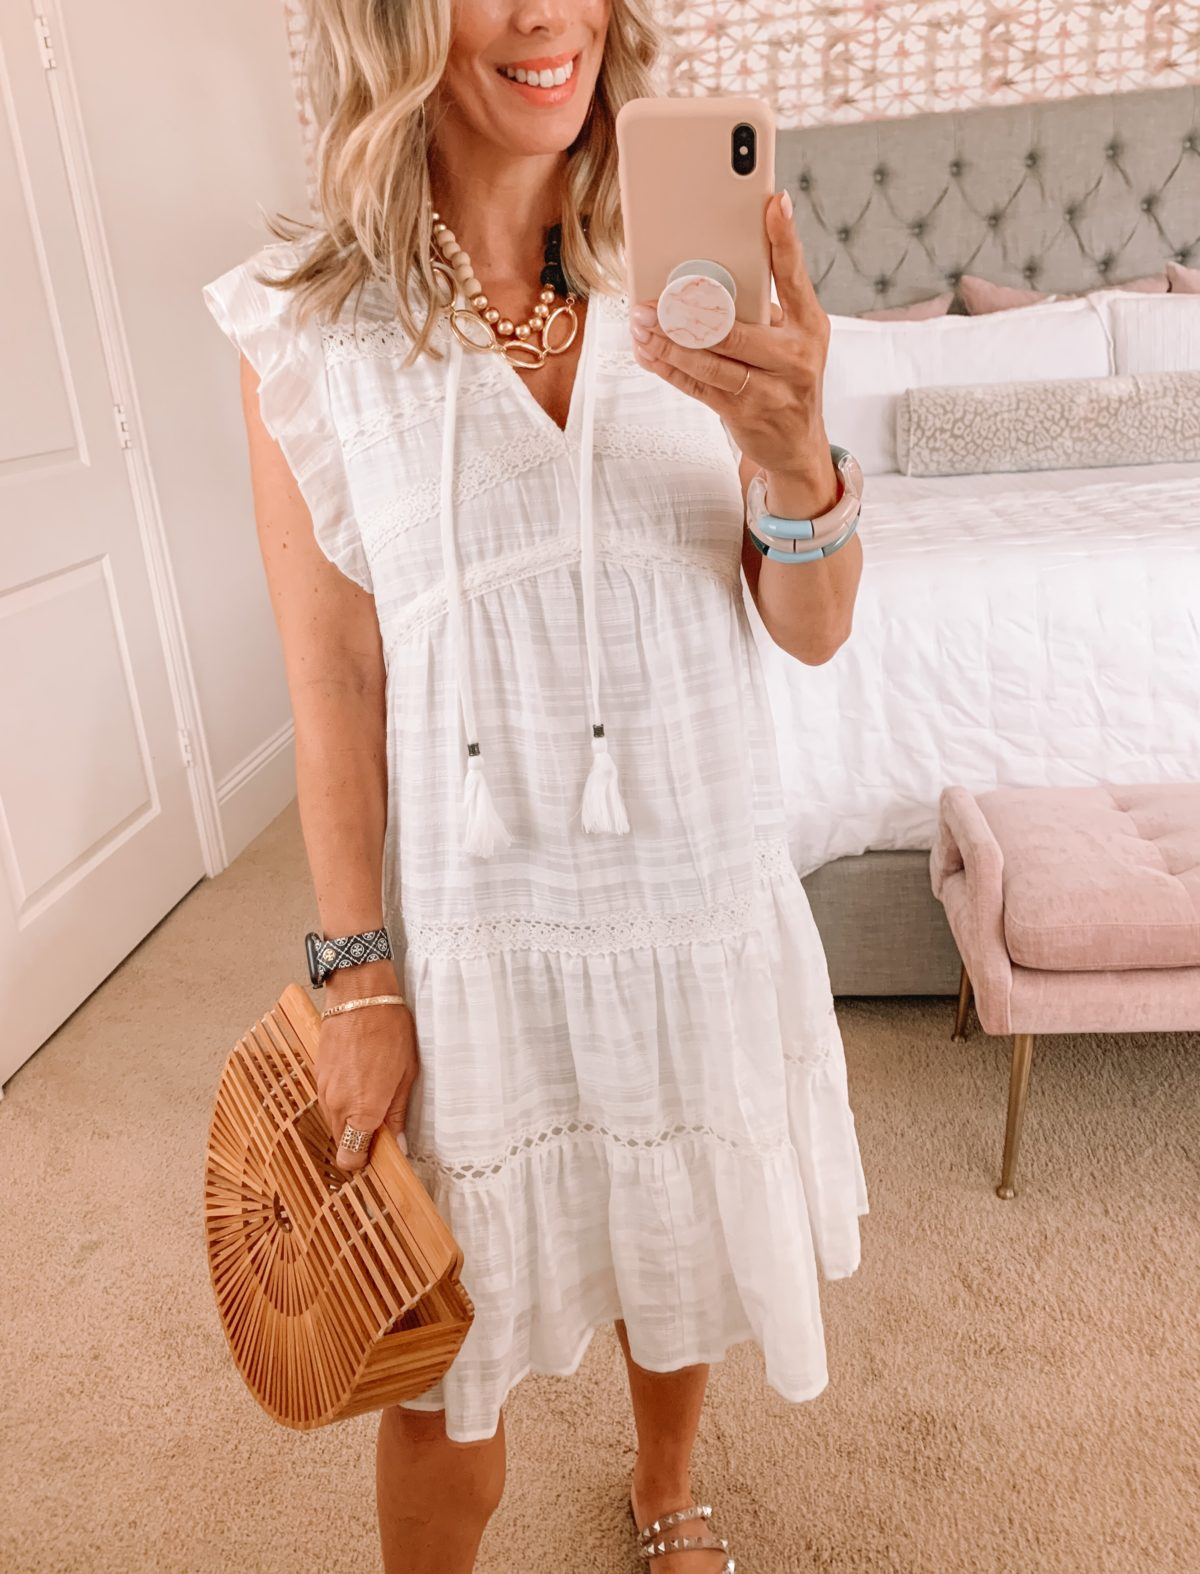 Dressing Room Finds, Target Dress and Studded Sandals